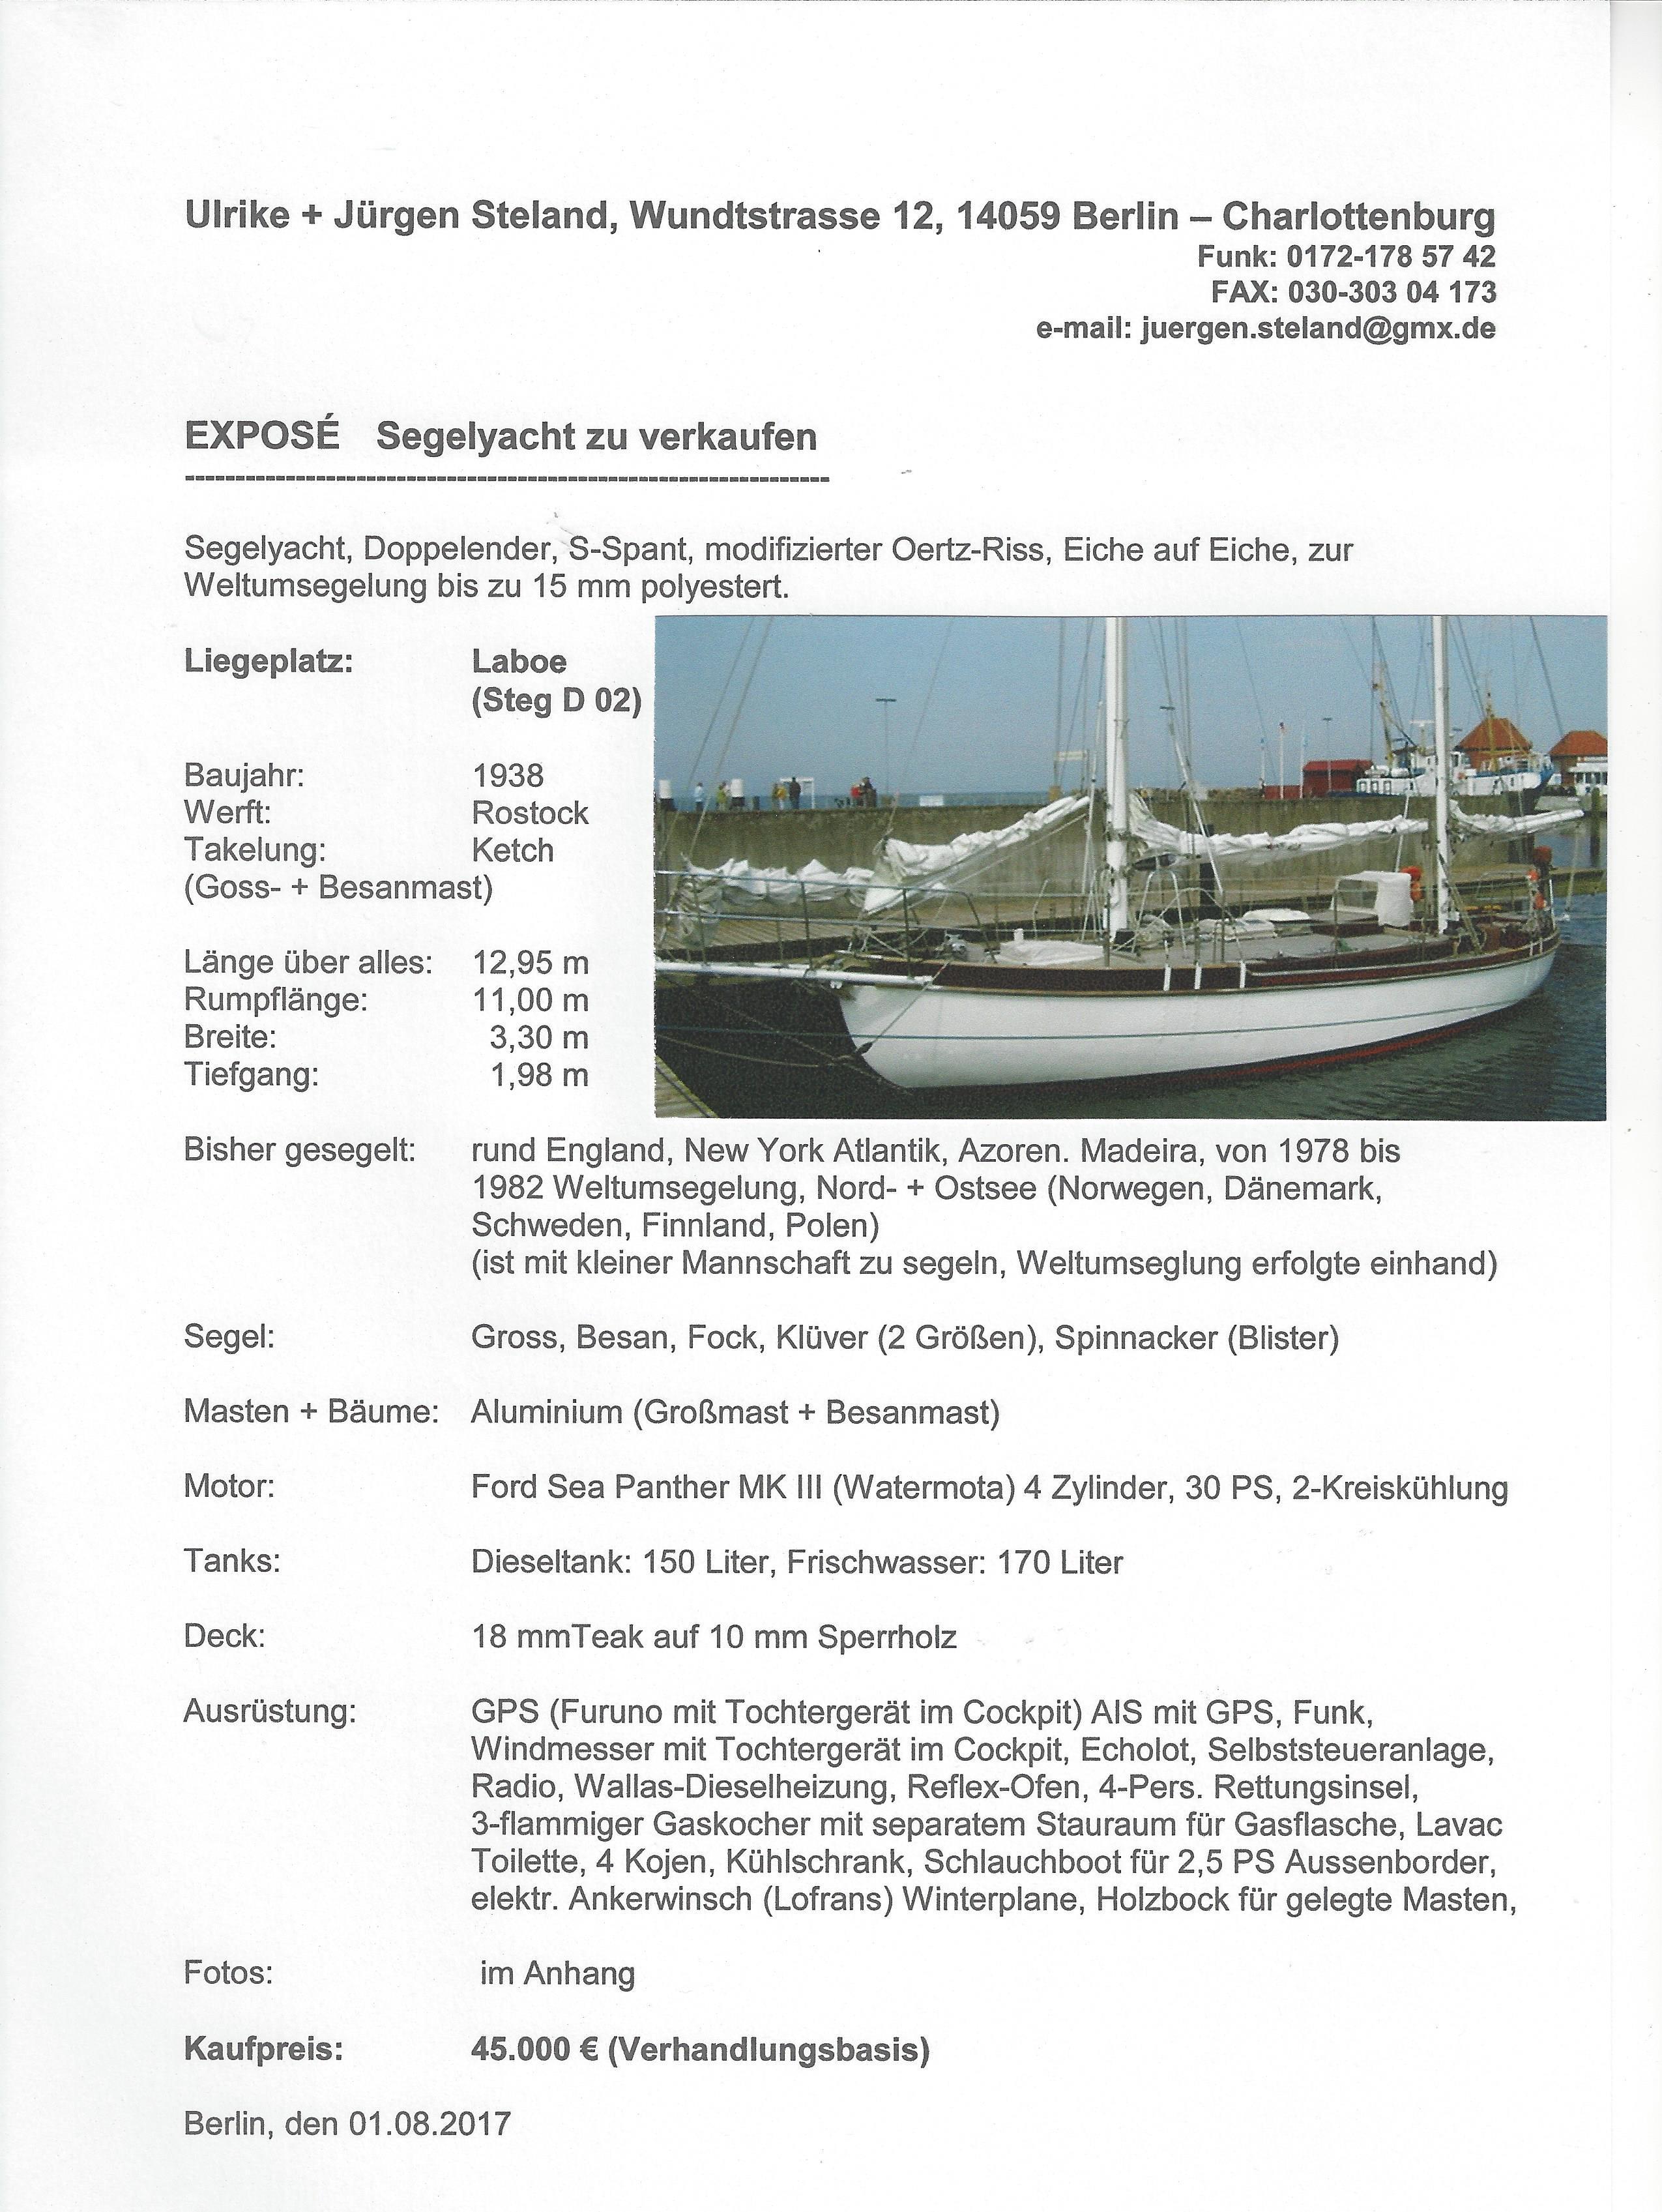 Boatyard Rostock